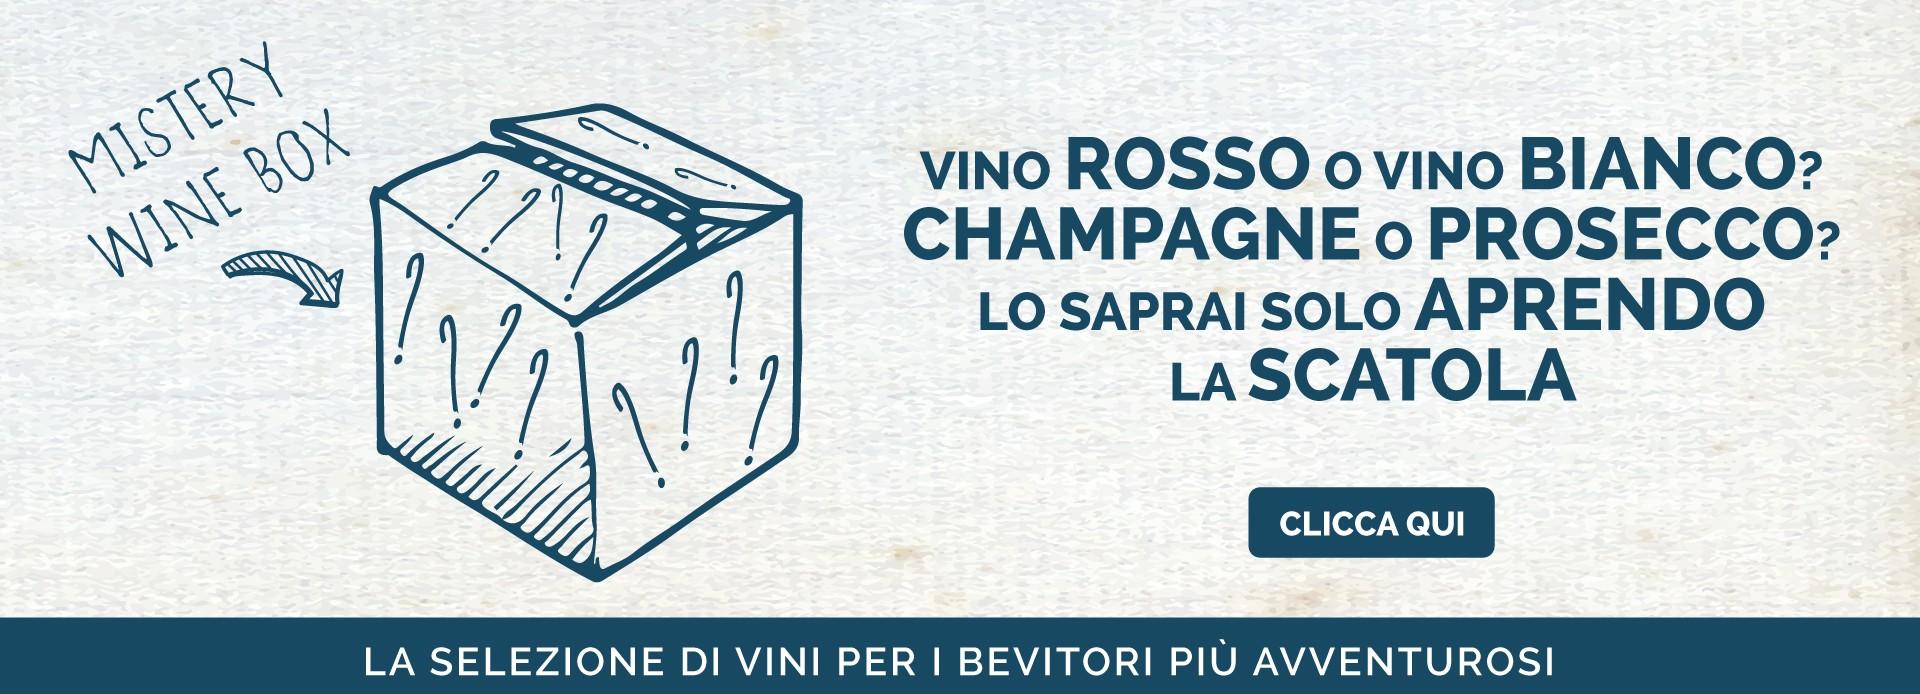 Enoteca Mandolese Wine Mistery Box